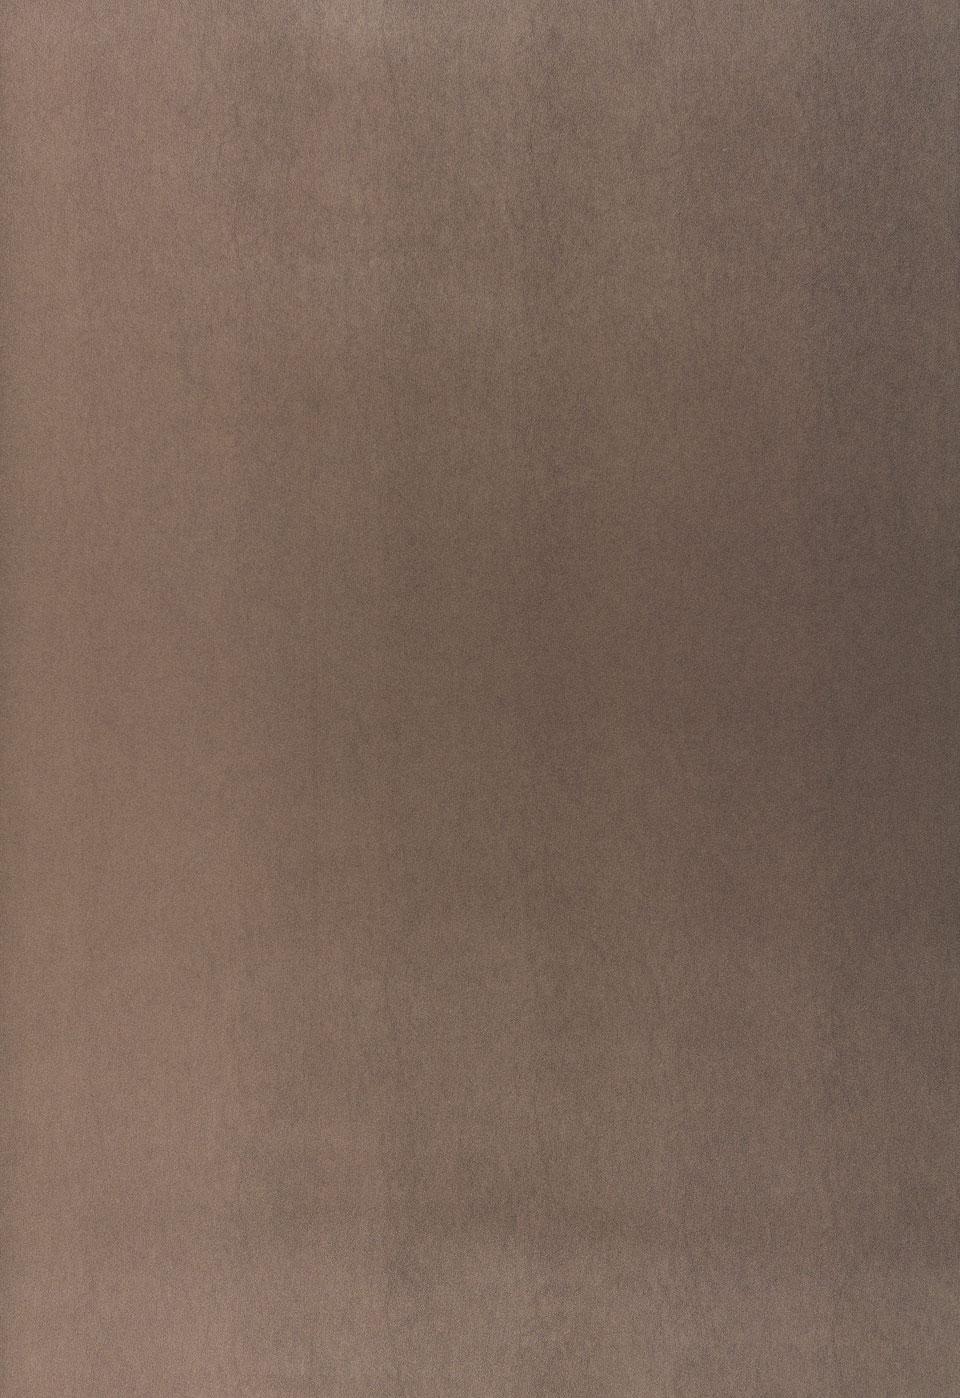 Американские обои Schumacher,  коллекция Luxe Lodge, артикул5006312